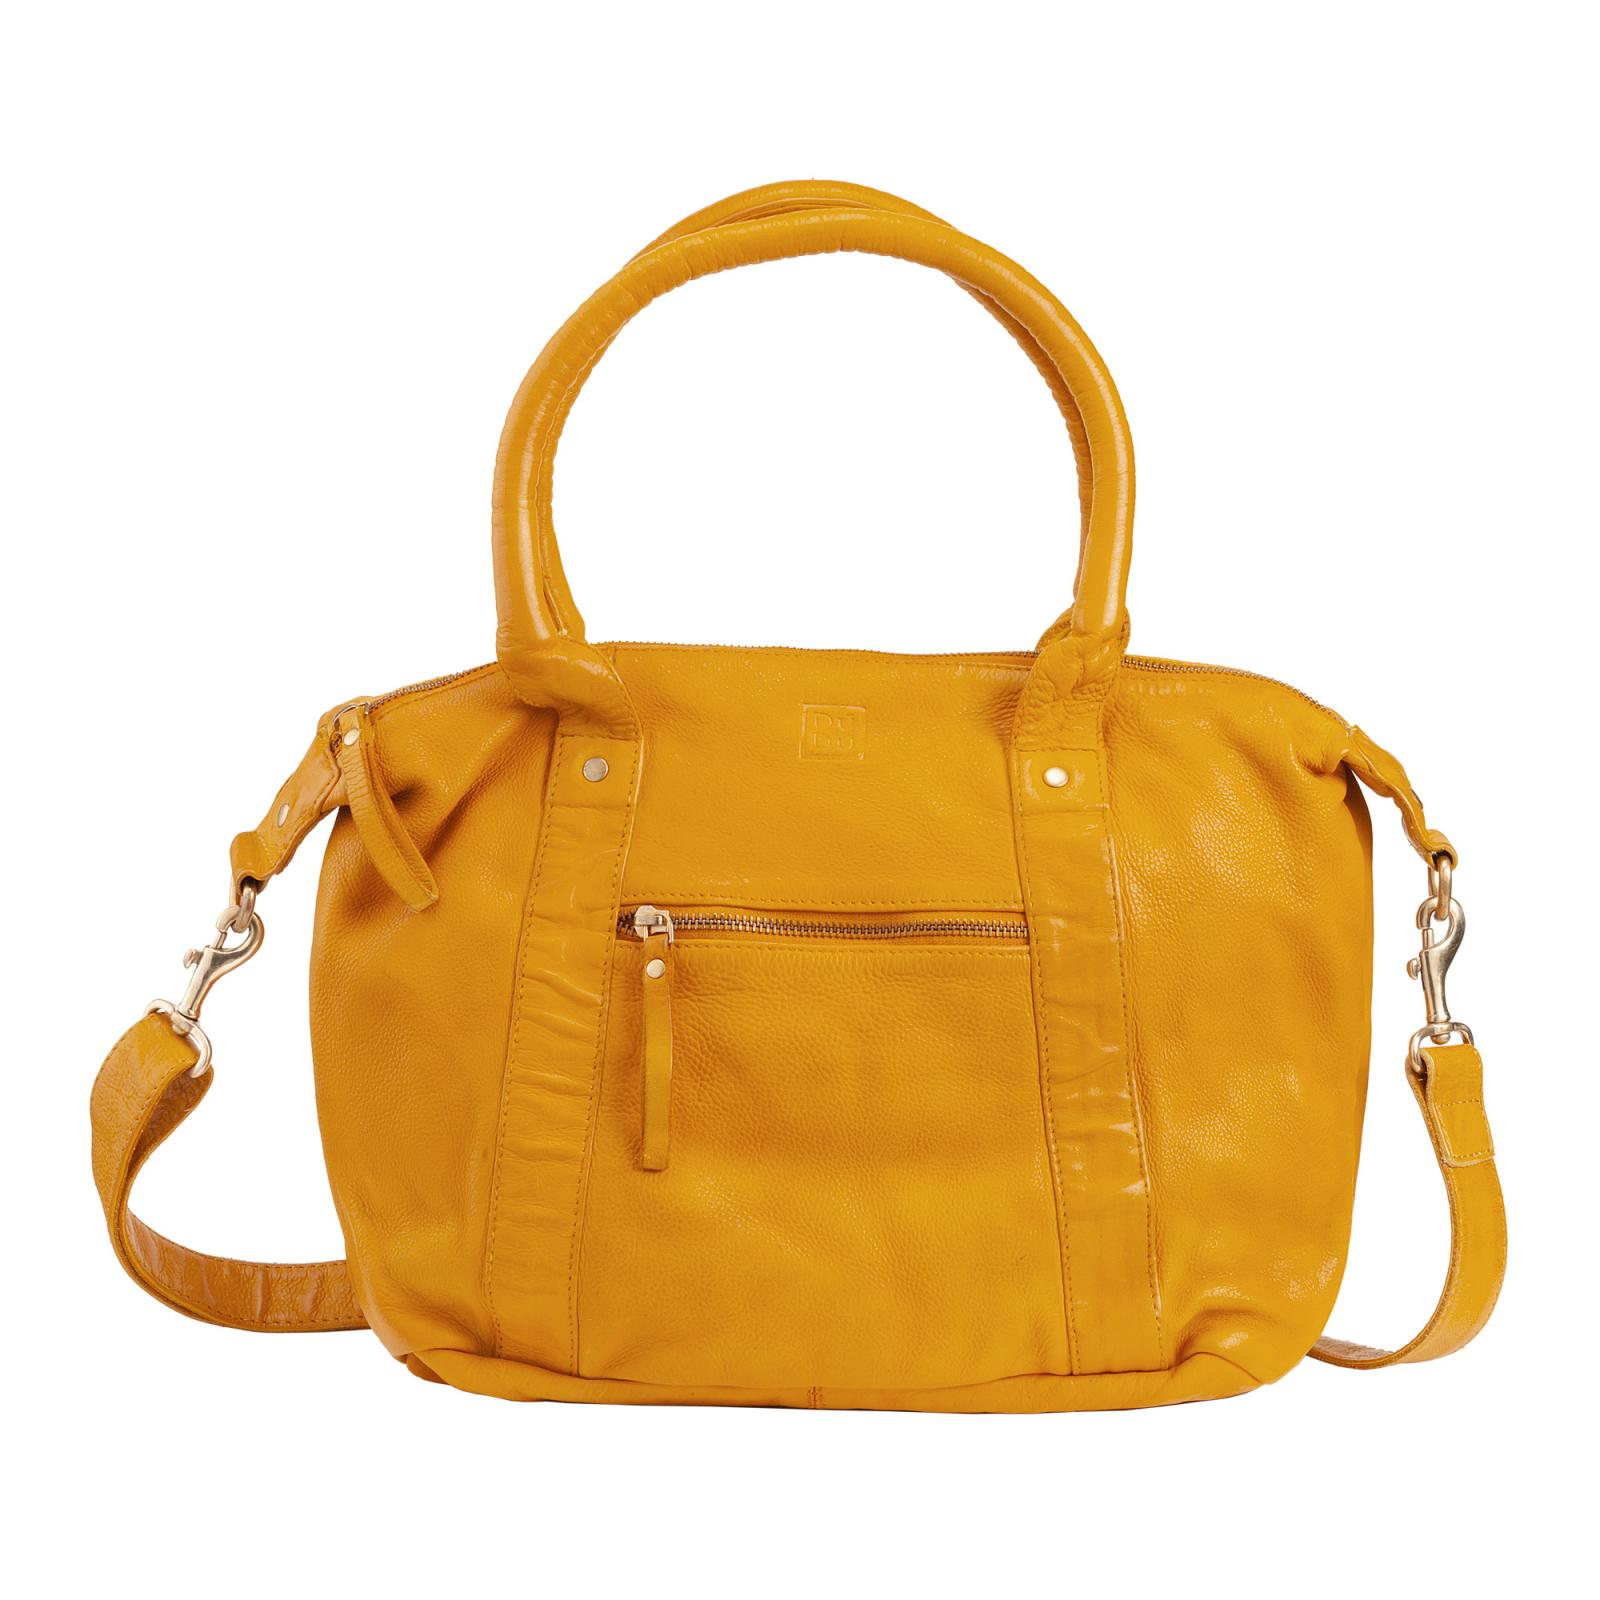 Borse  Donna  Timeless - Bag  - Saffron Yellow